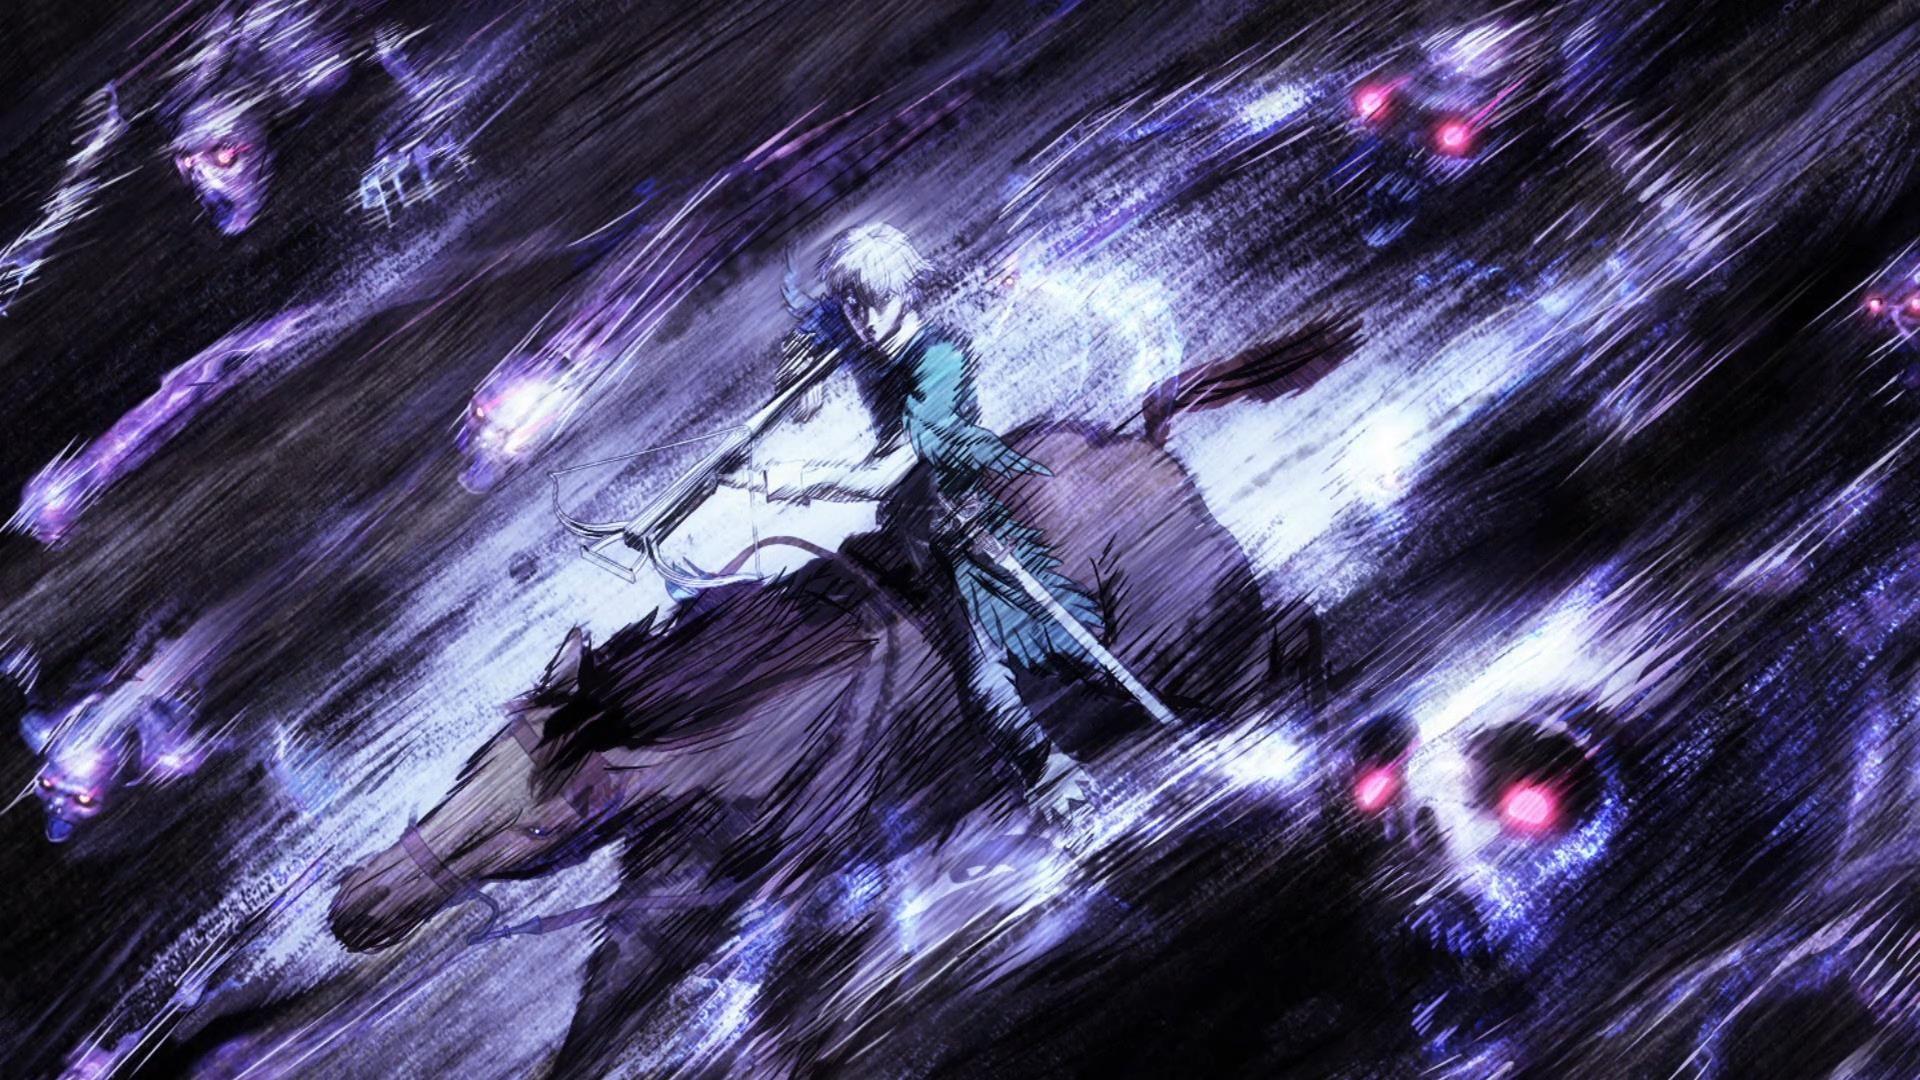 #Berserk #Manga